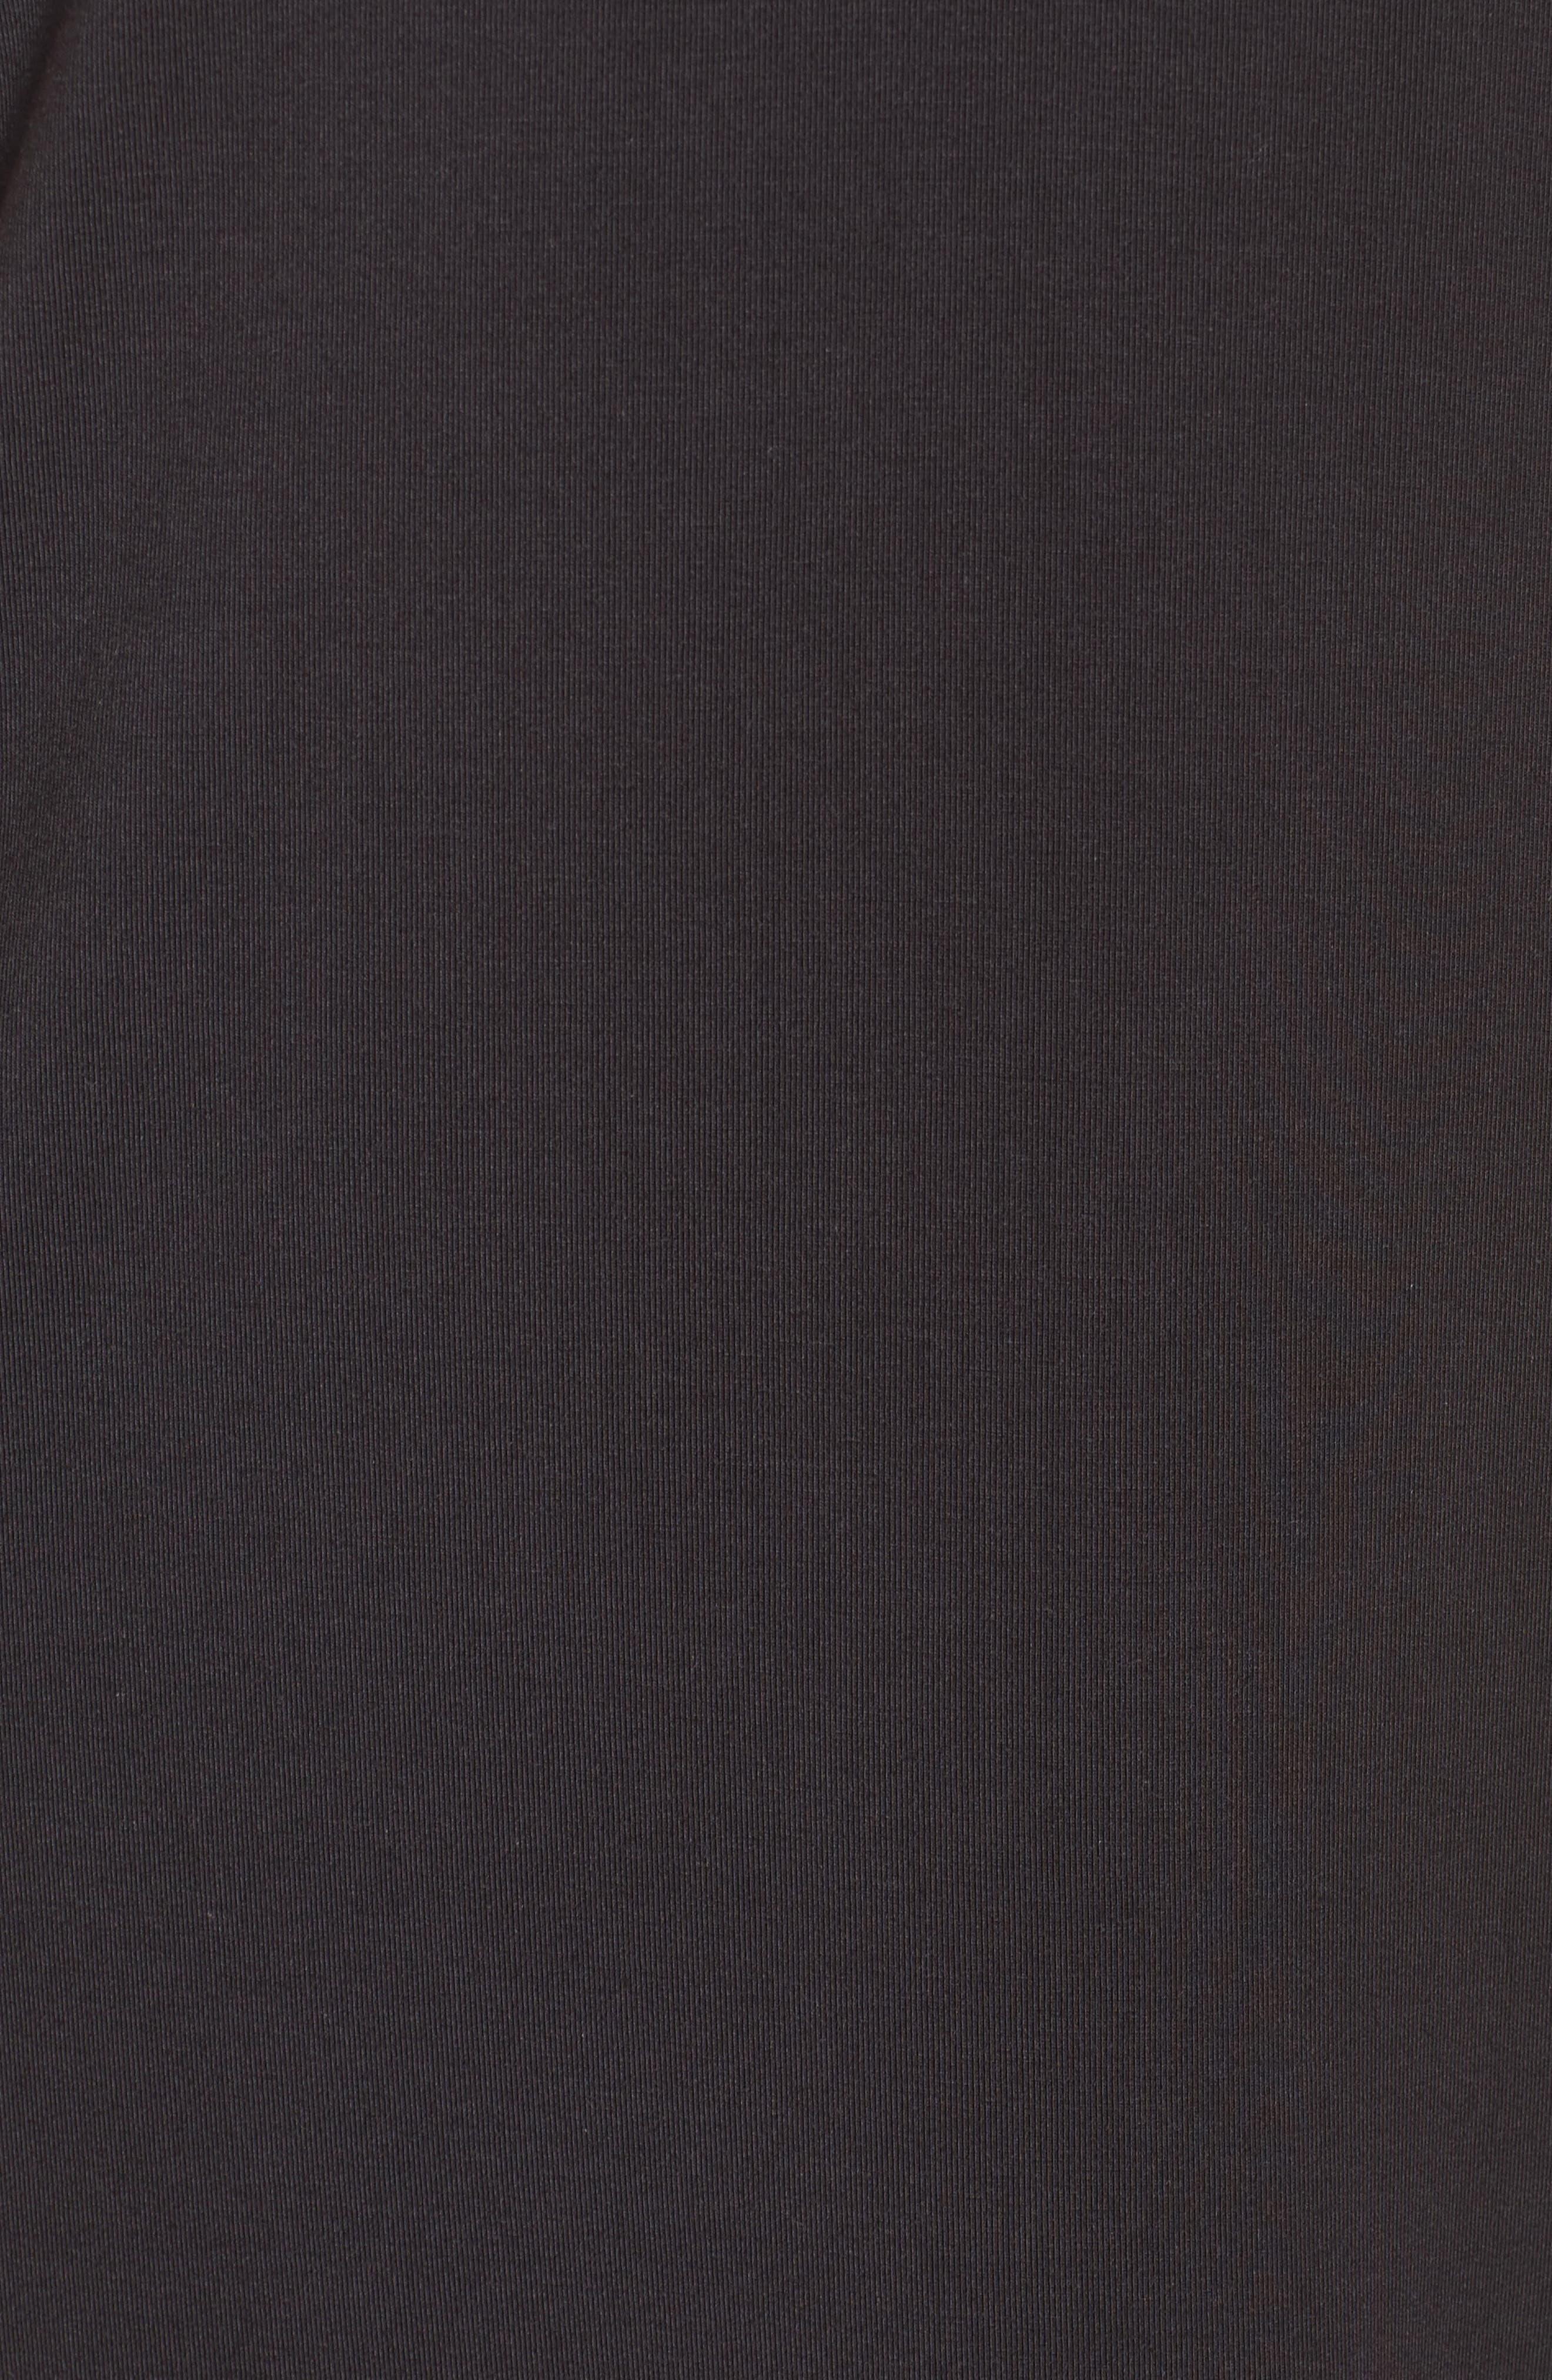 'City Essentials' V-Neck Sleep Shirt,                             Alternate thumbnail 6, color,                             001